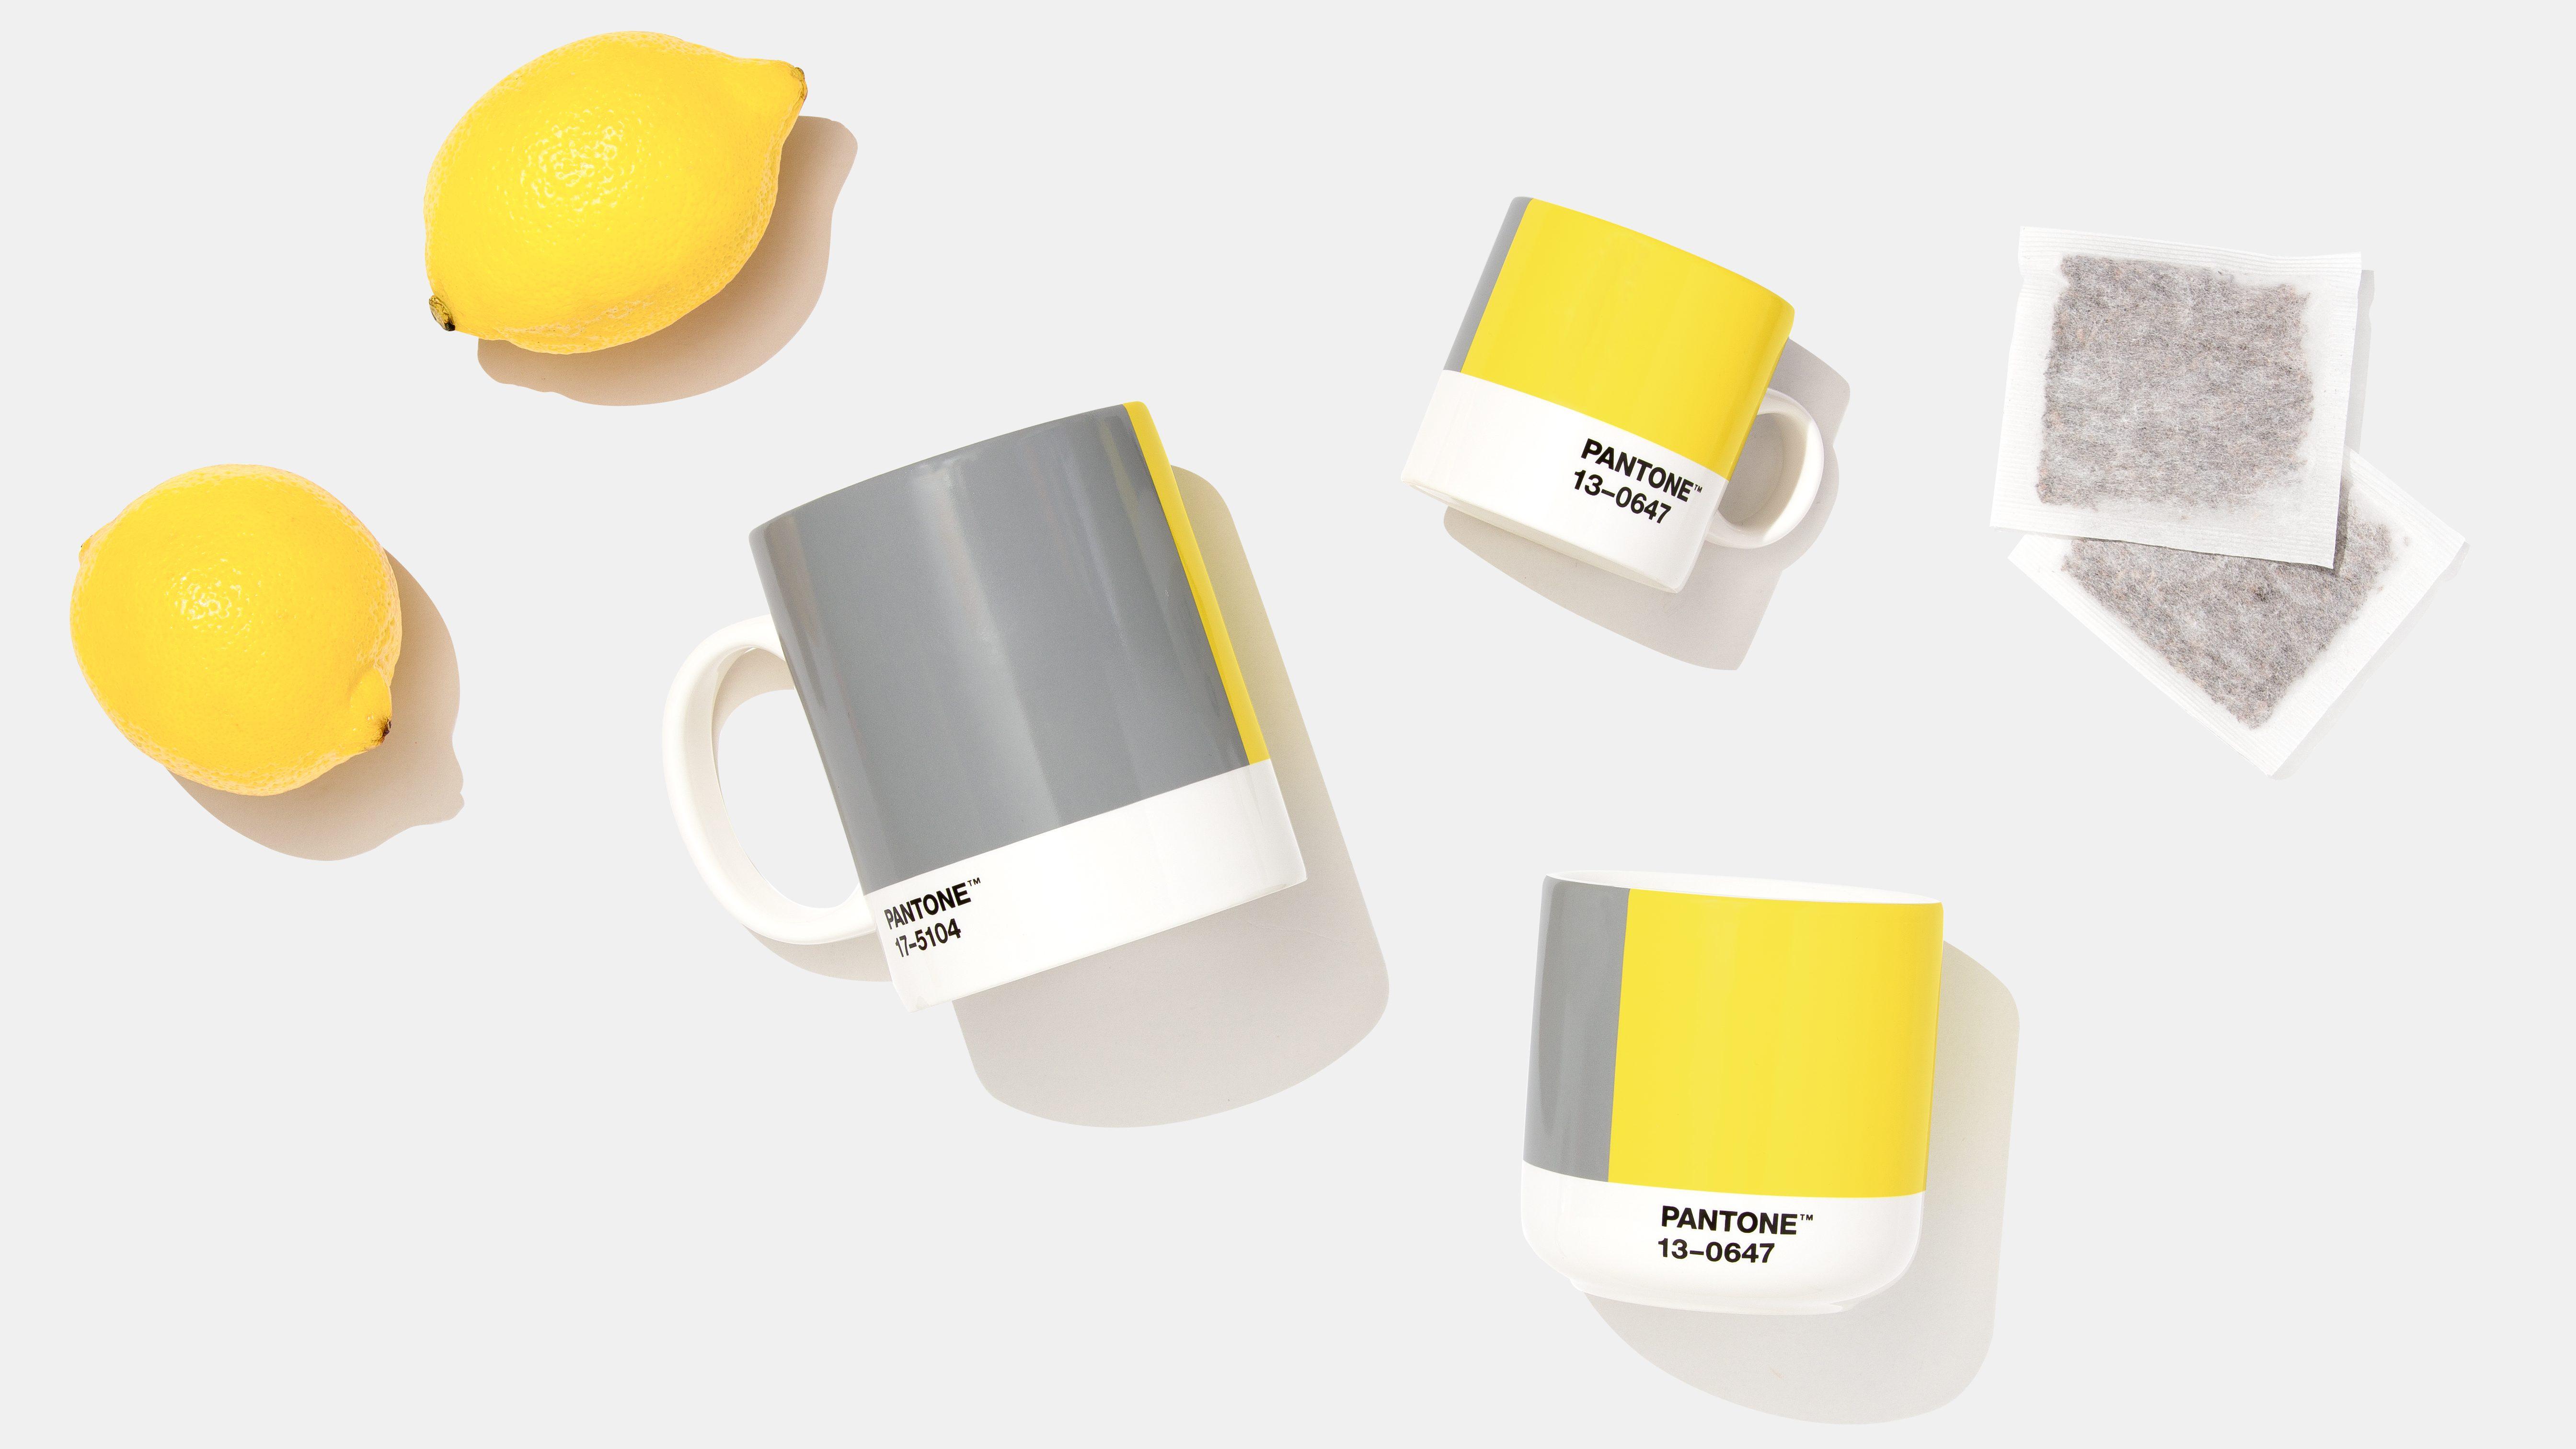 Pantones 2021 color picks: Ultimate Gray and Illuminating yellow